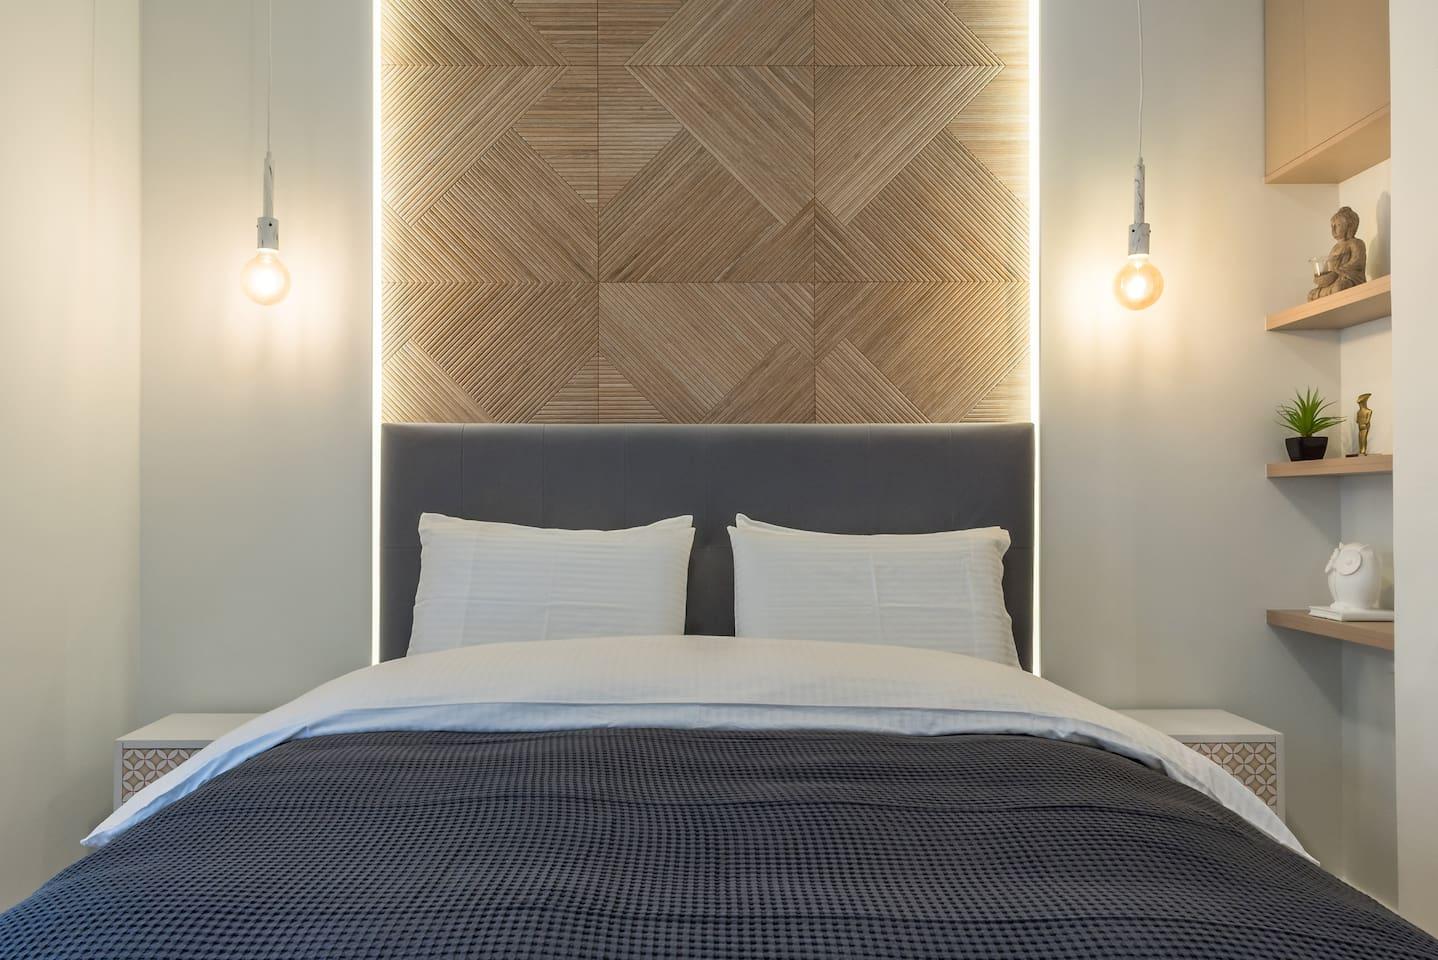 Master bedroom with exquisite detailing